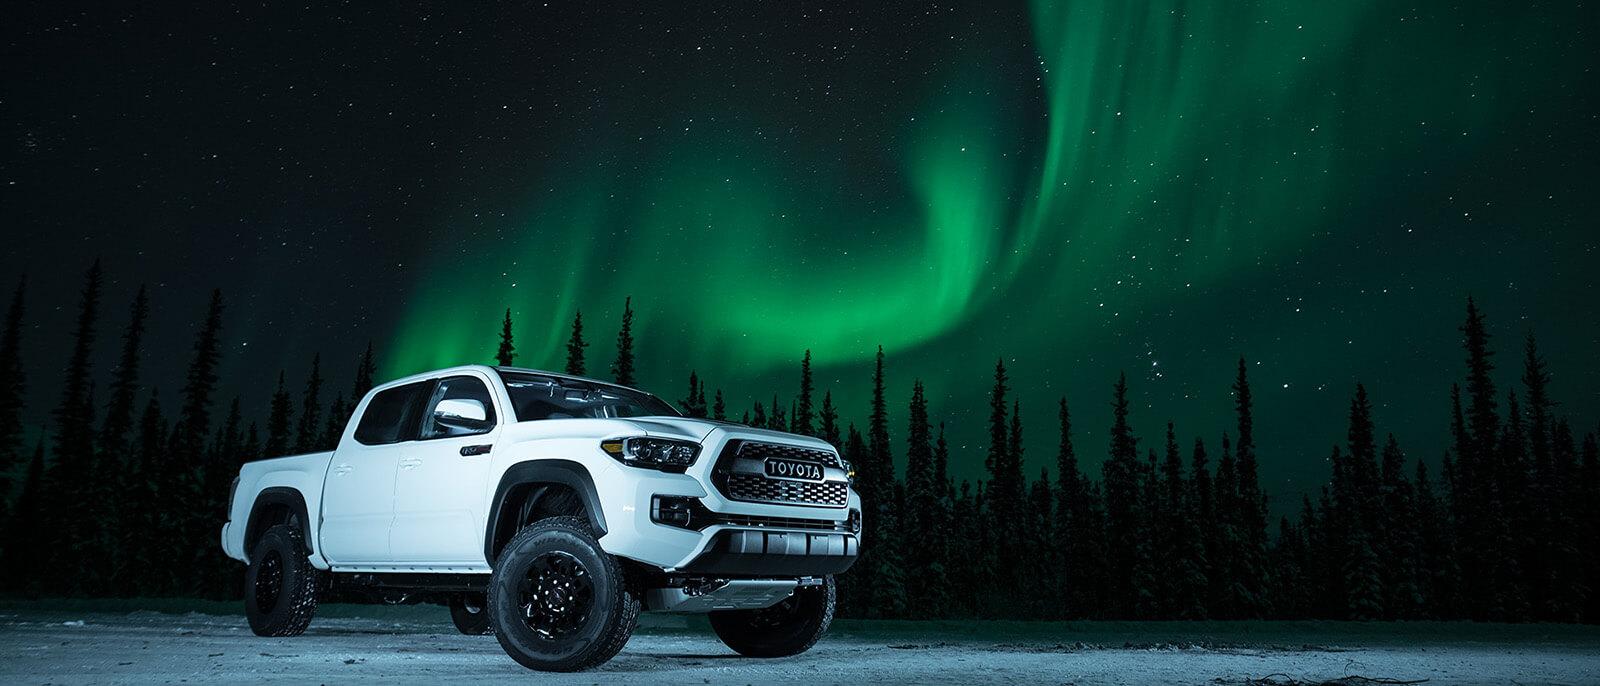 2017 Toyota Tacoma TRD Pro Aurora